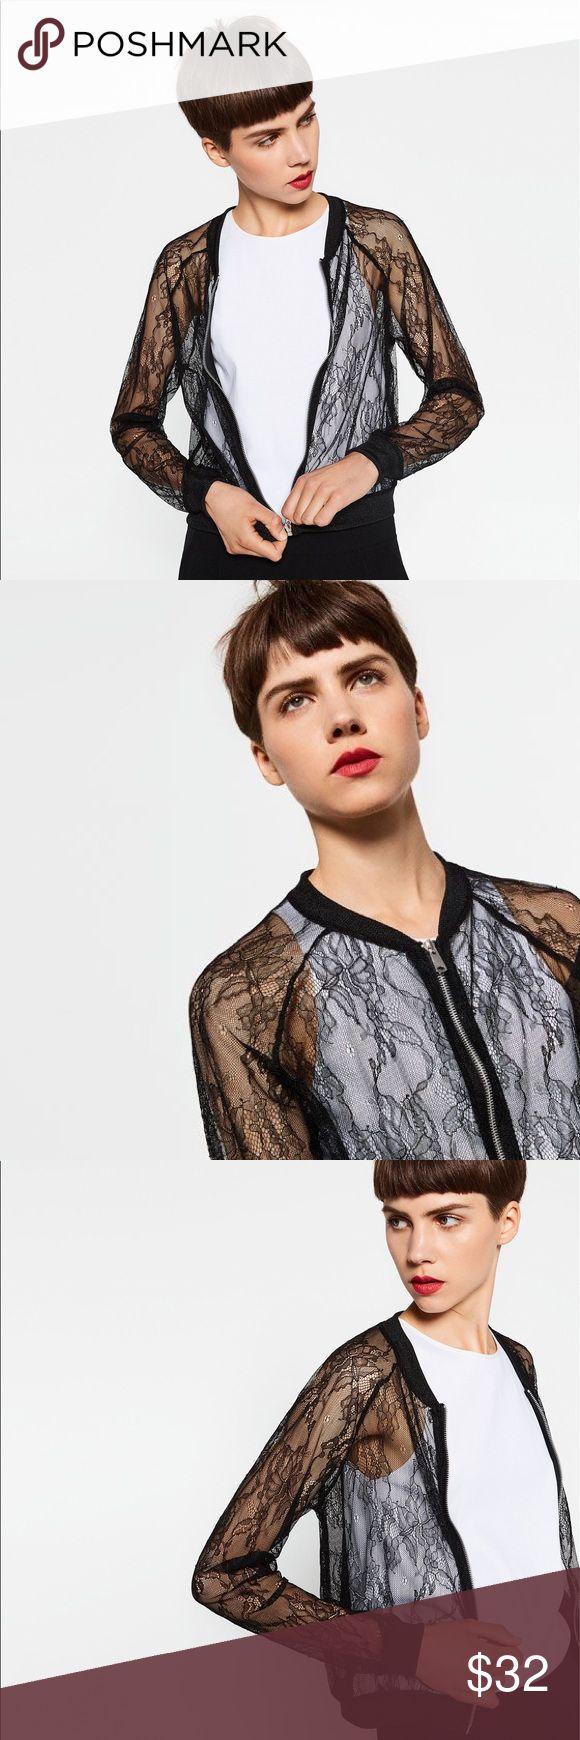 Zara Lace Bomber Jacket Chic Black Lace Zara Bomber in Like New Condition Zara Tops